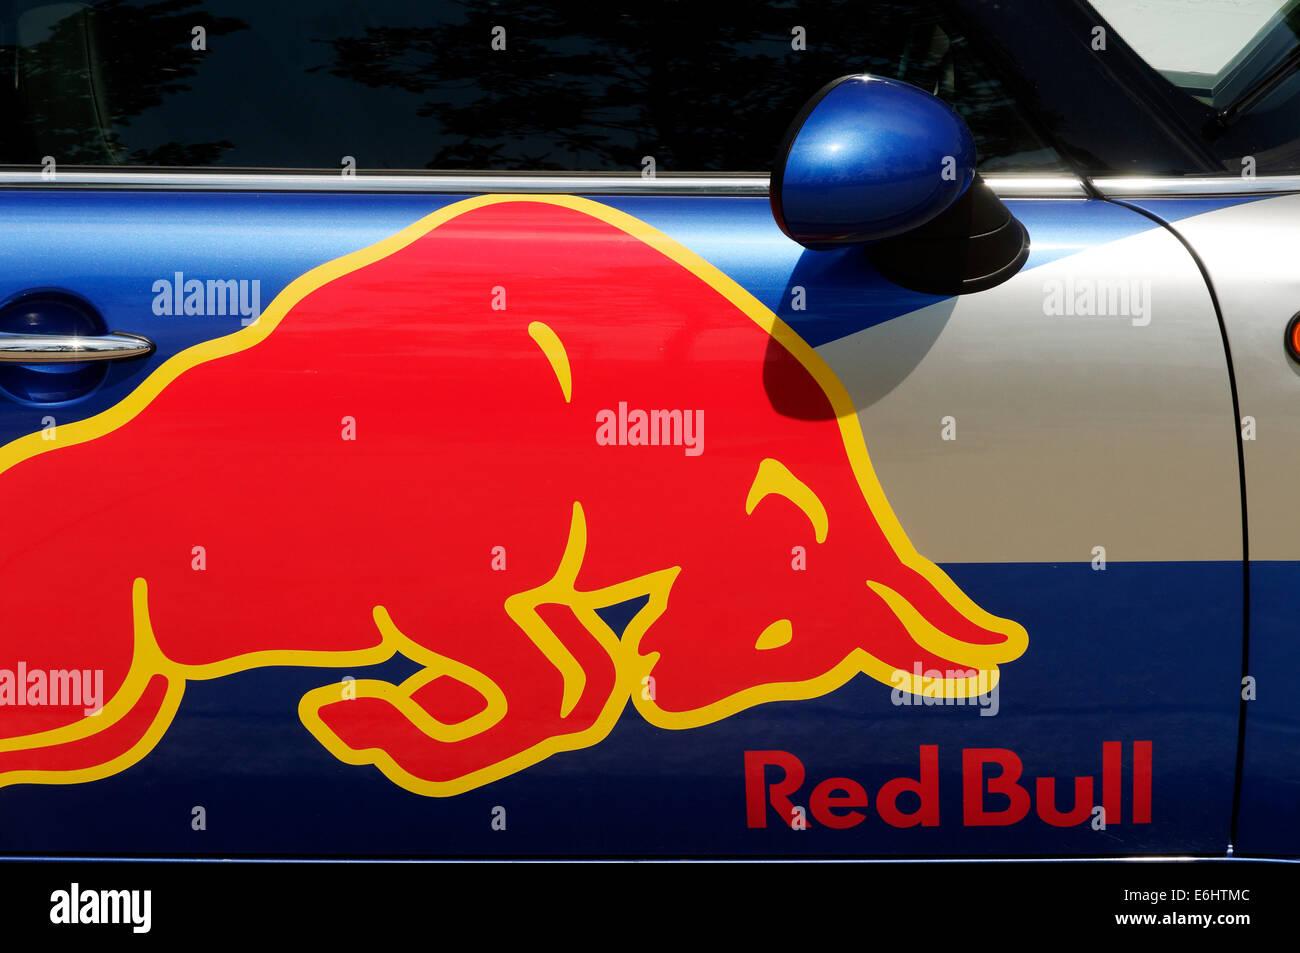 A Red Bull Mini - Stock Image